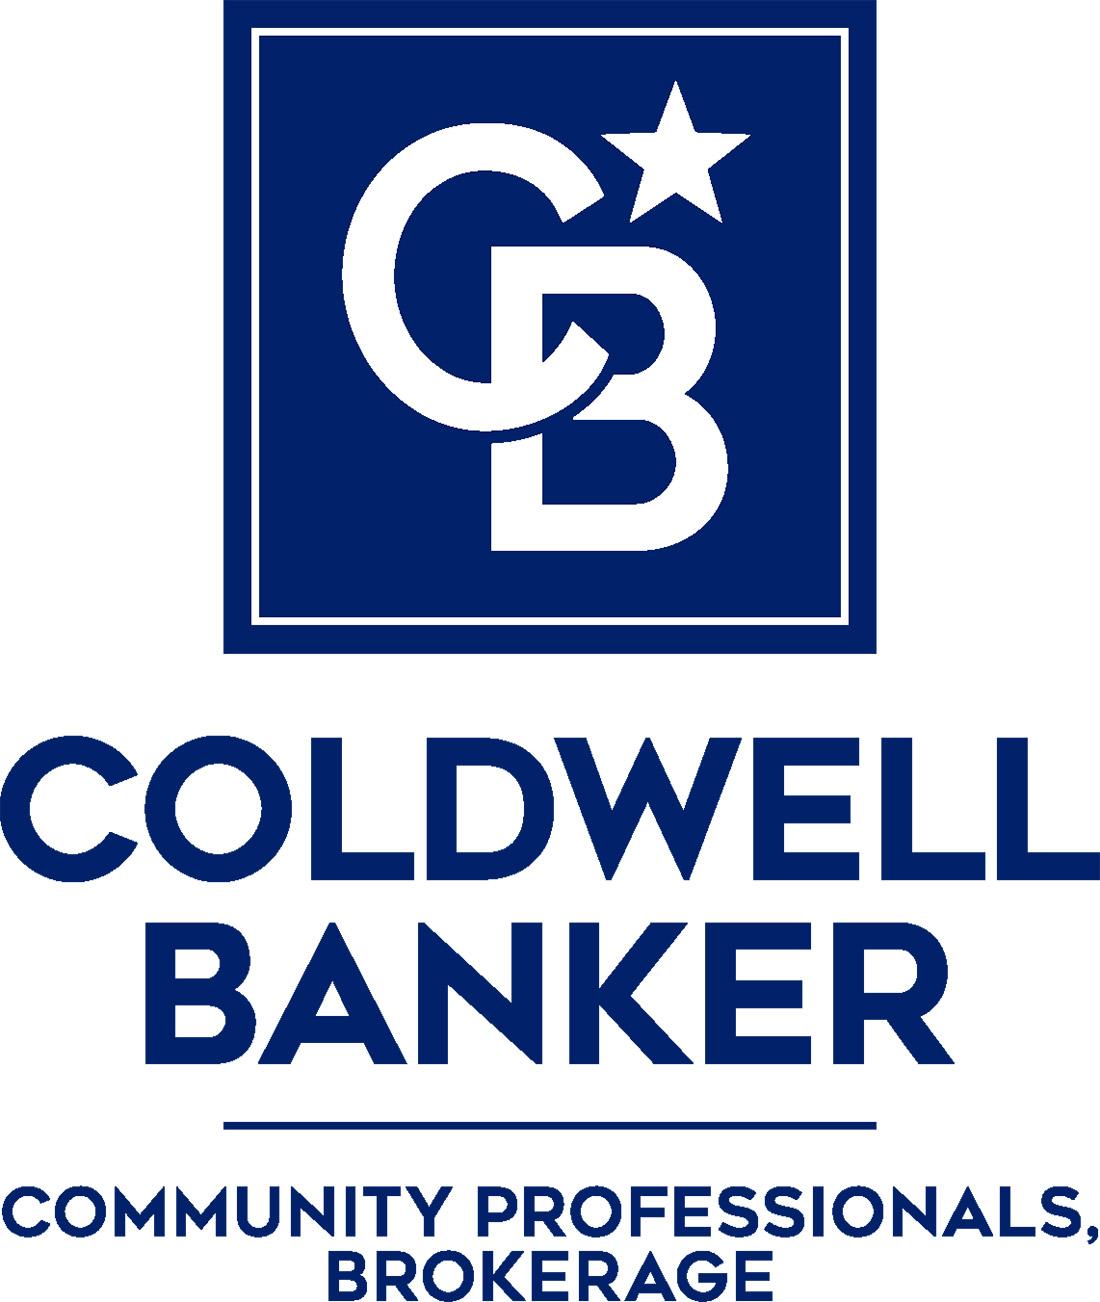 Sue Hale - Coldwell Banker Community Professionals Logo